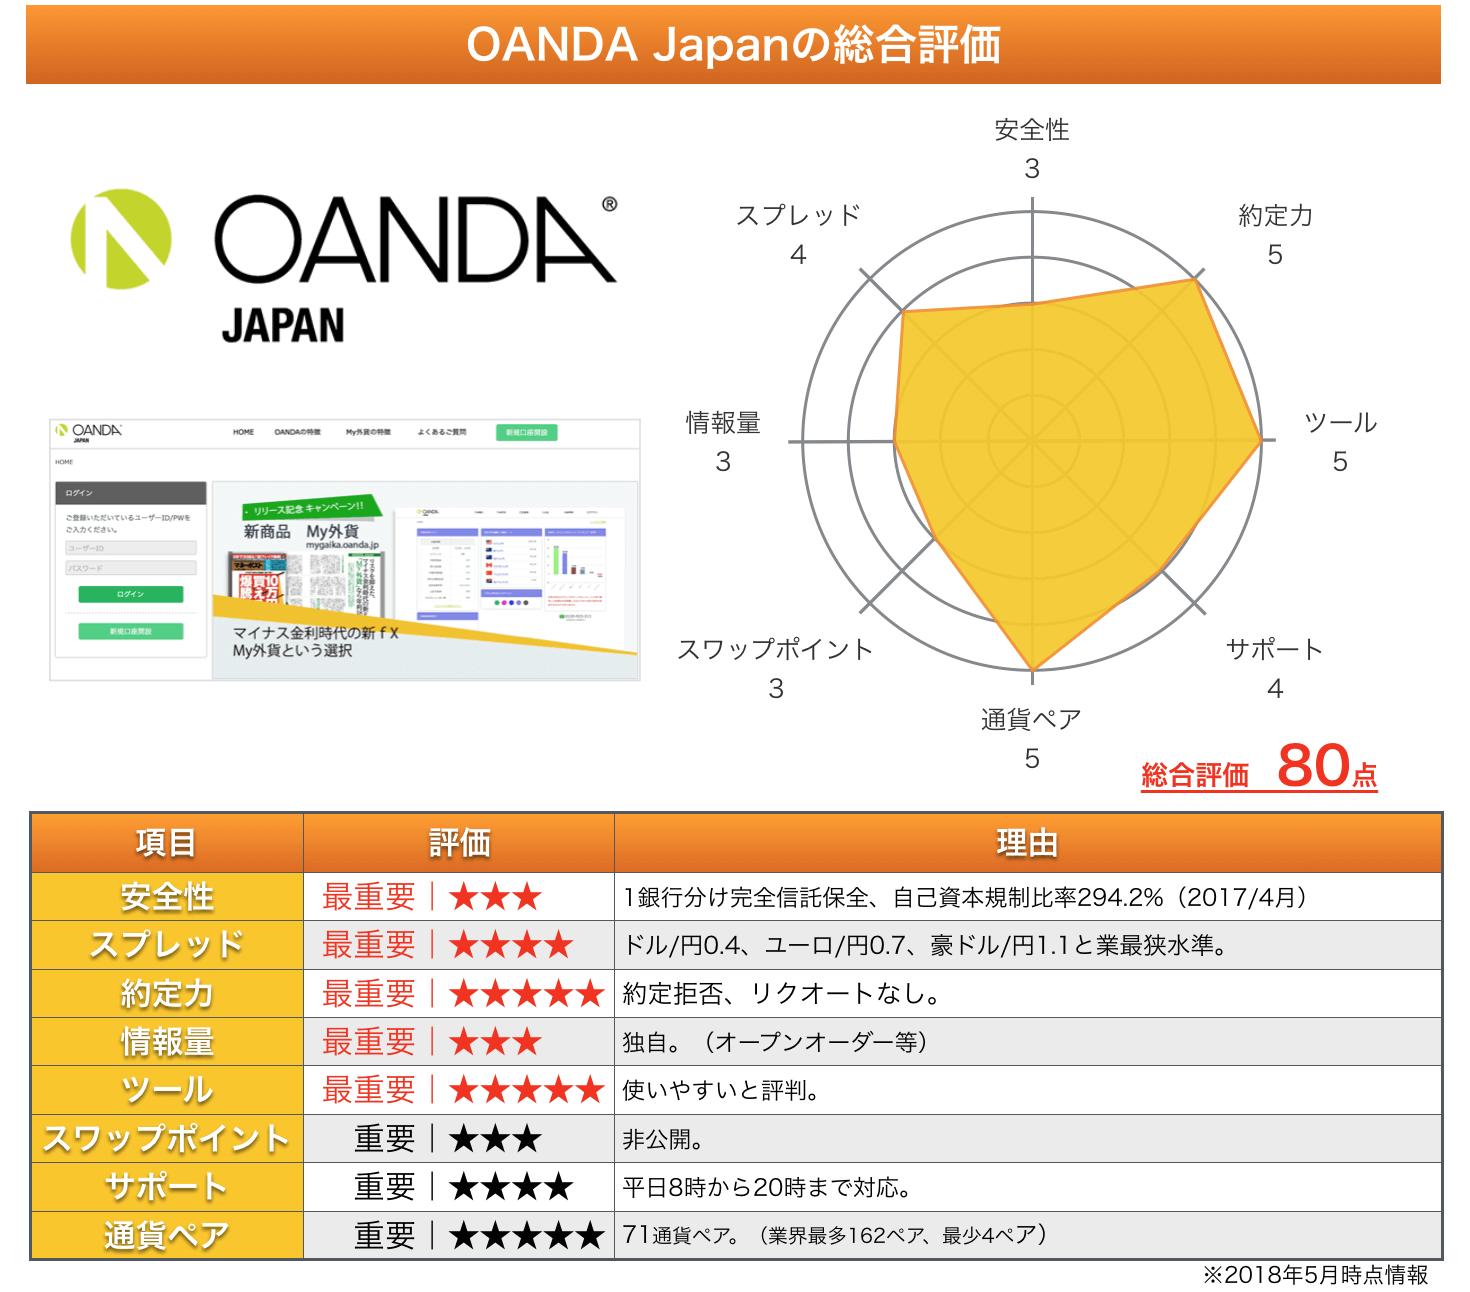 OANDA Japanの総評